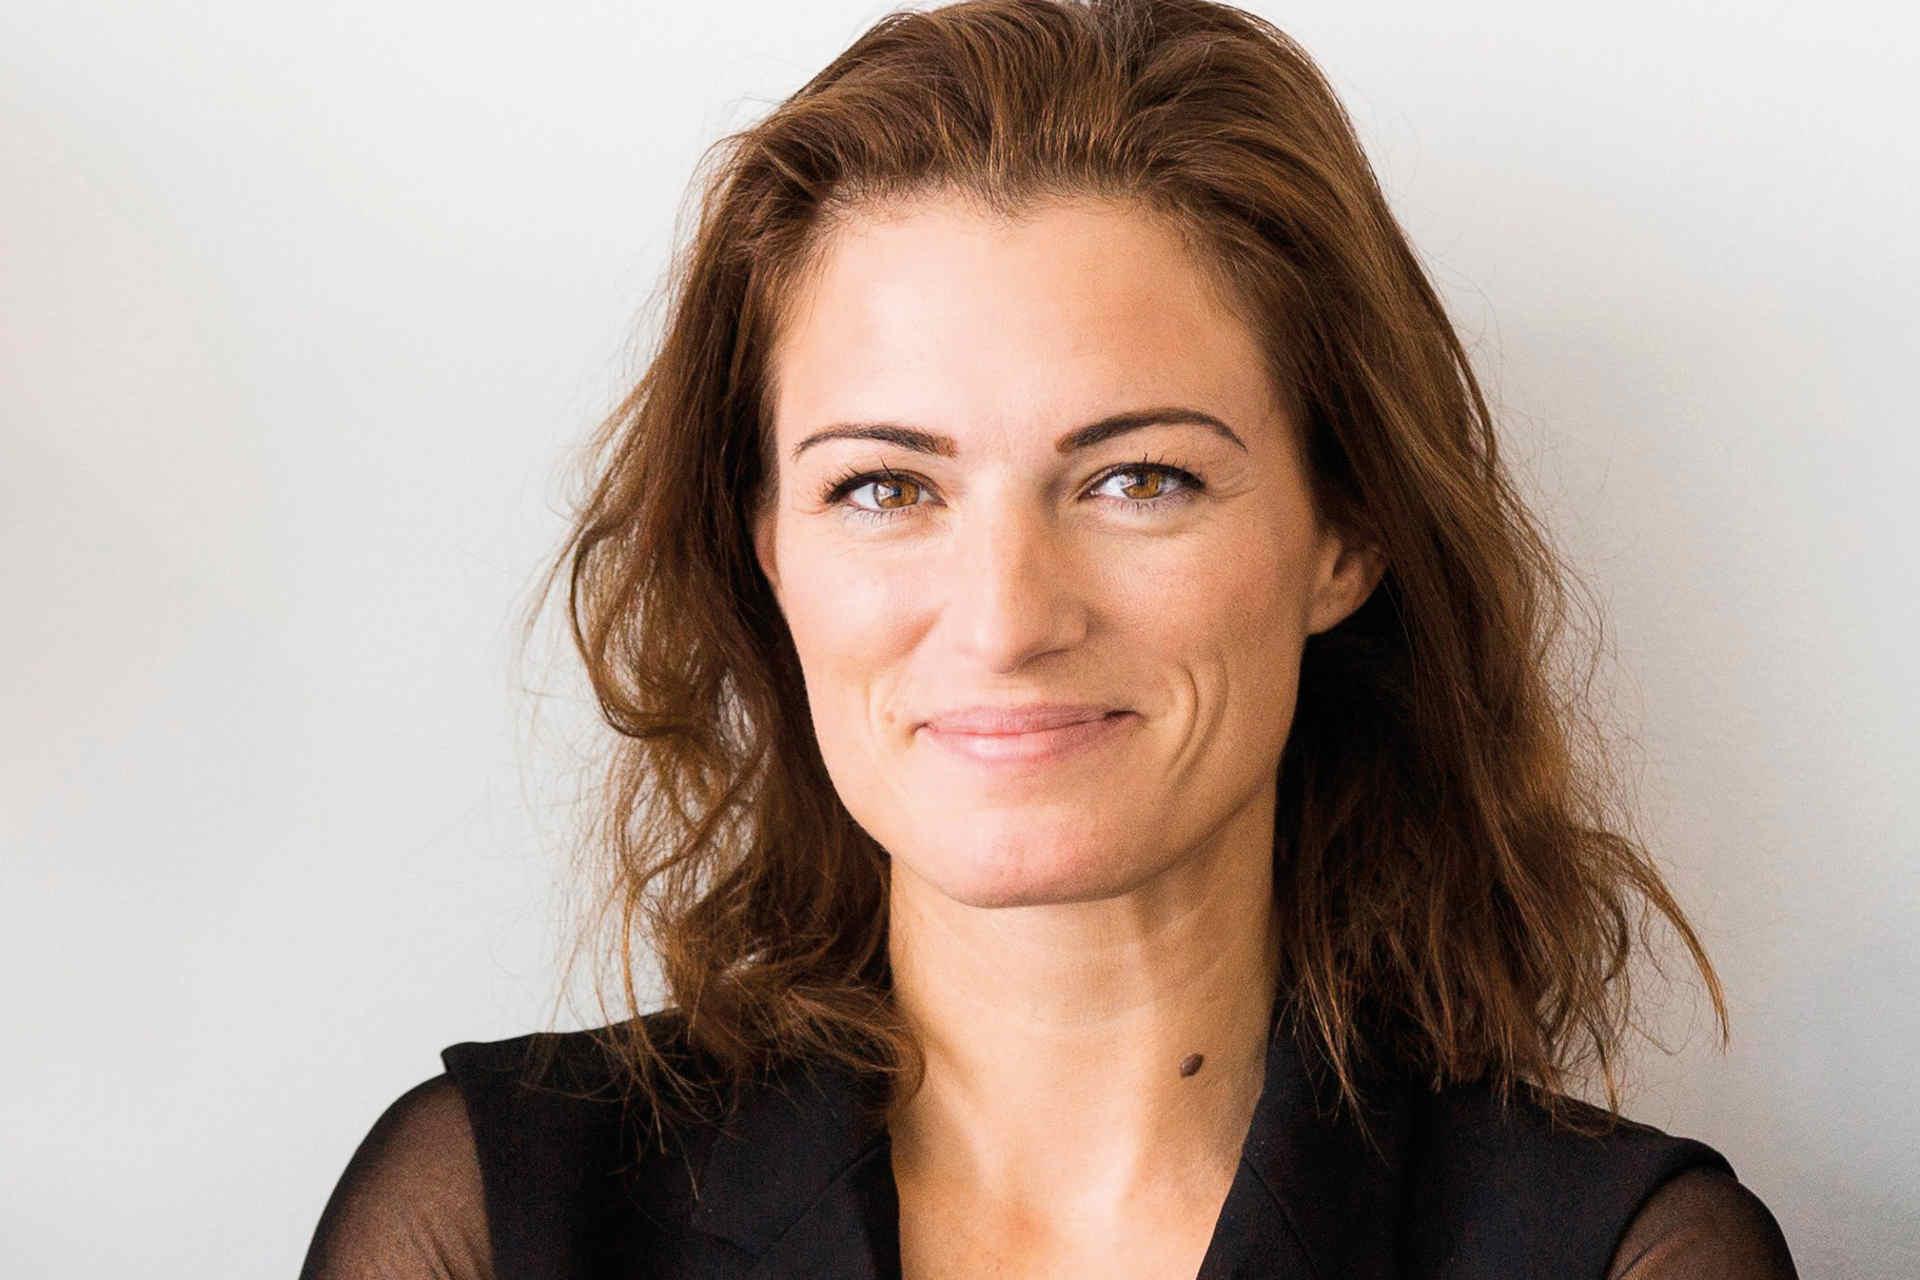 Verena Konrad, Kommissärin Foto: Darko Todorovic